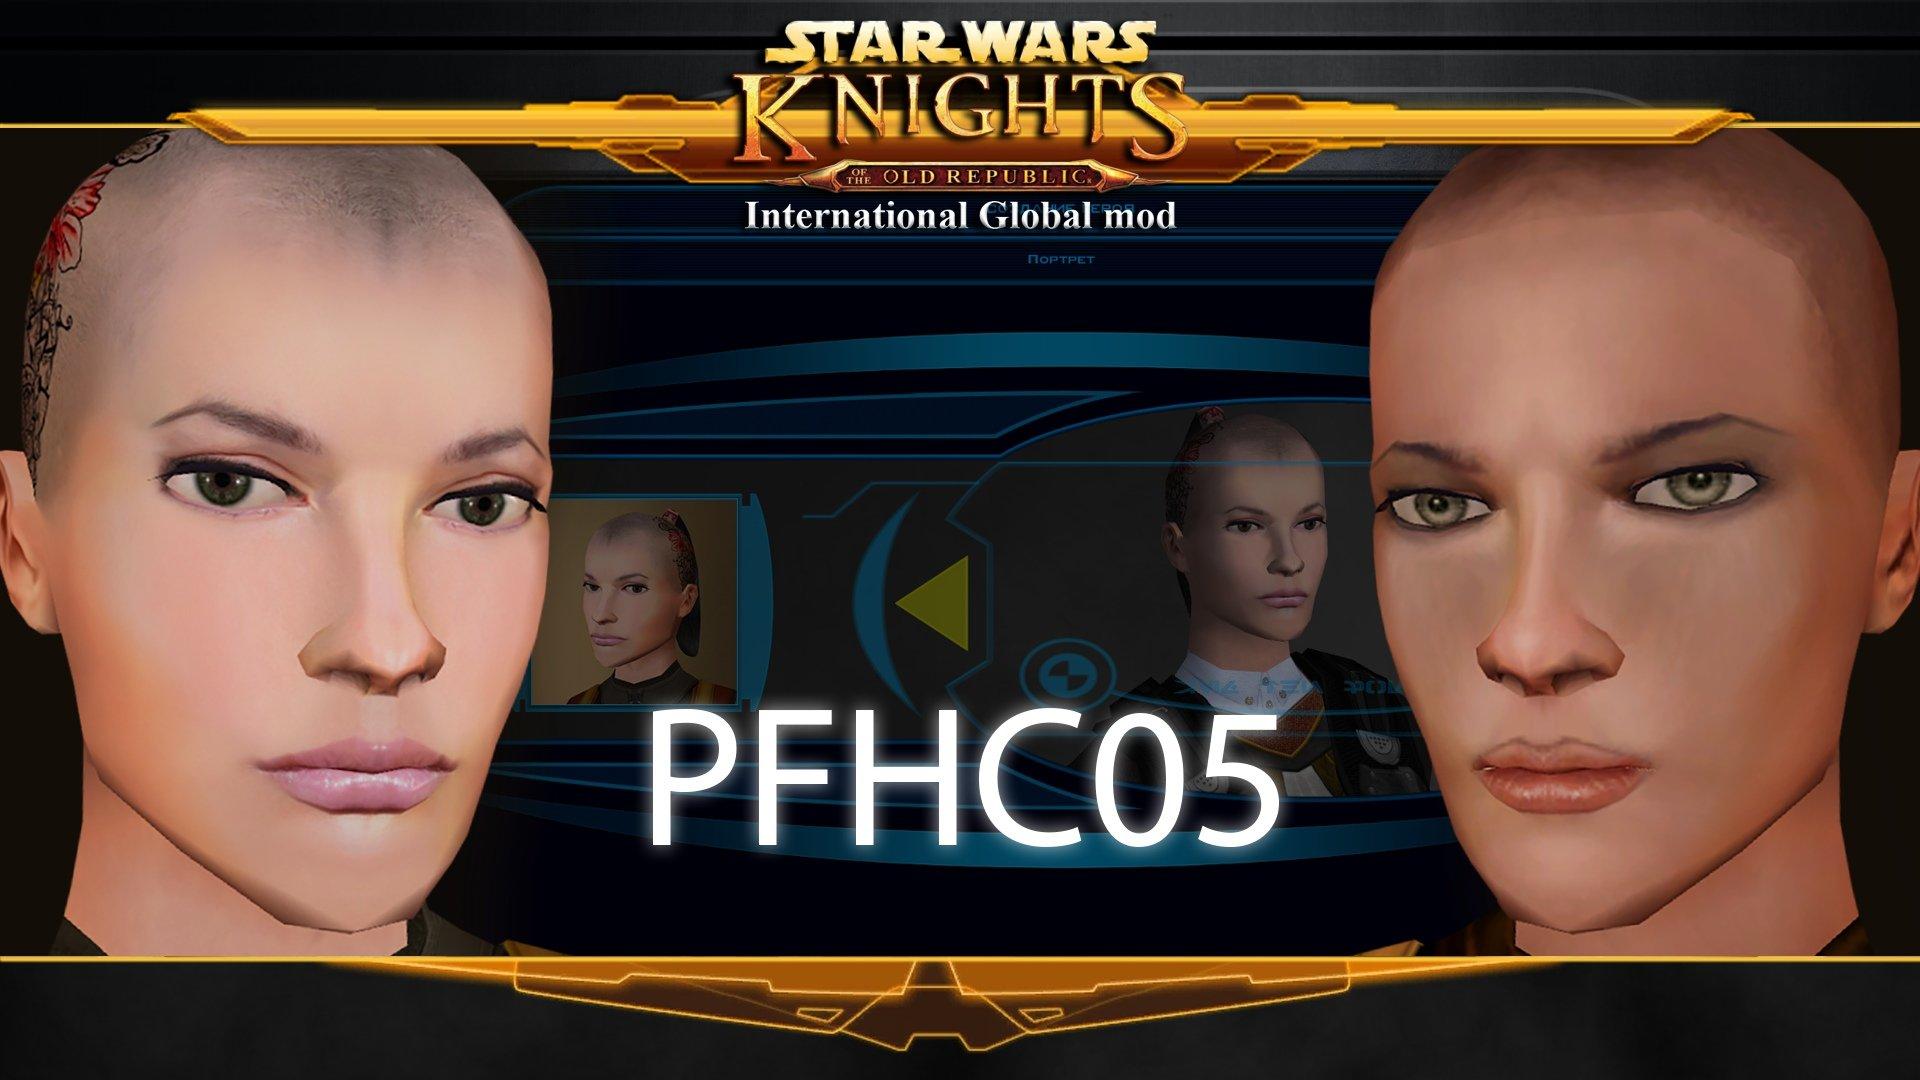 PFHC05